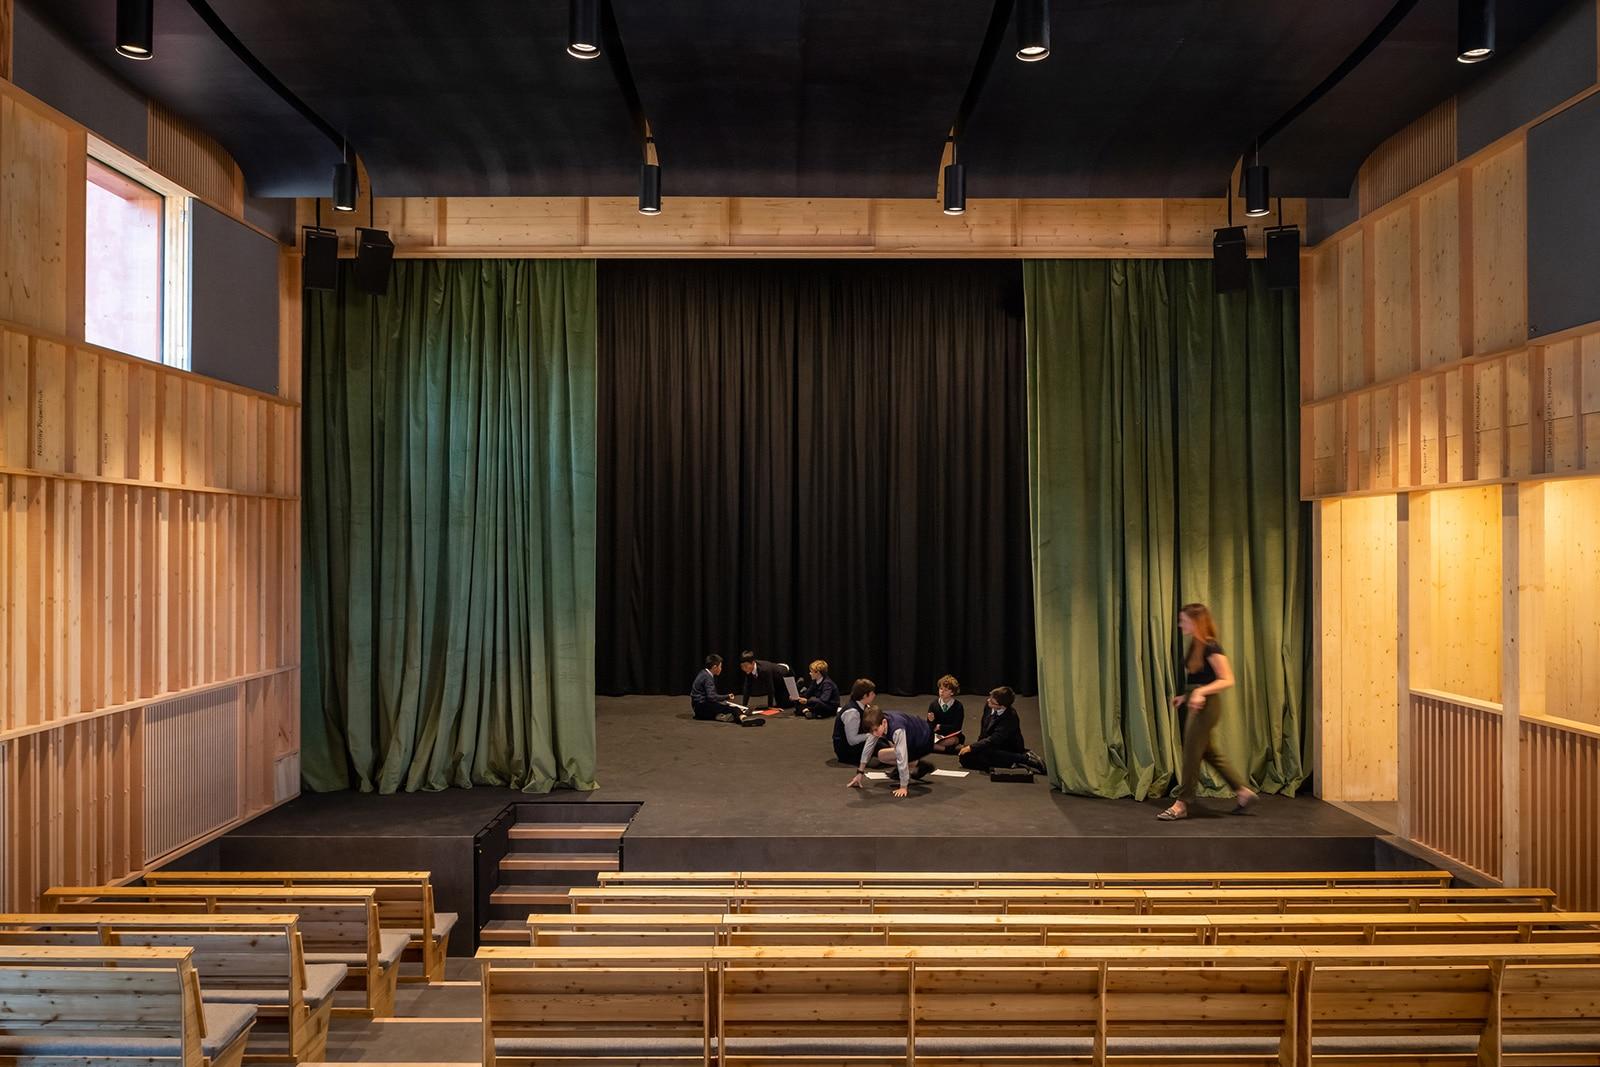 David Brownlow Theatre  - 4.1 Jim Stephenson 1 39